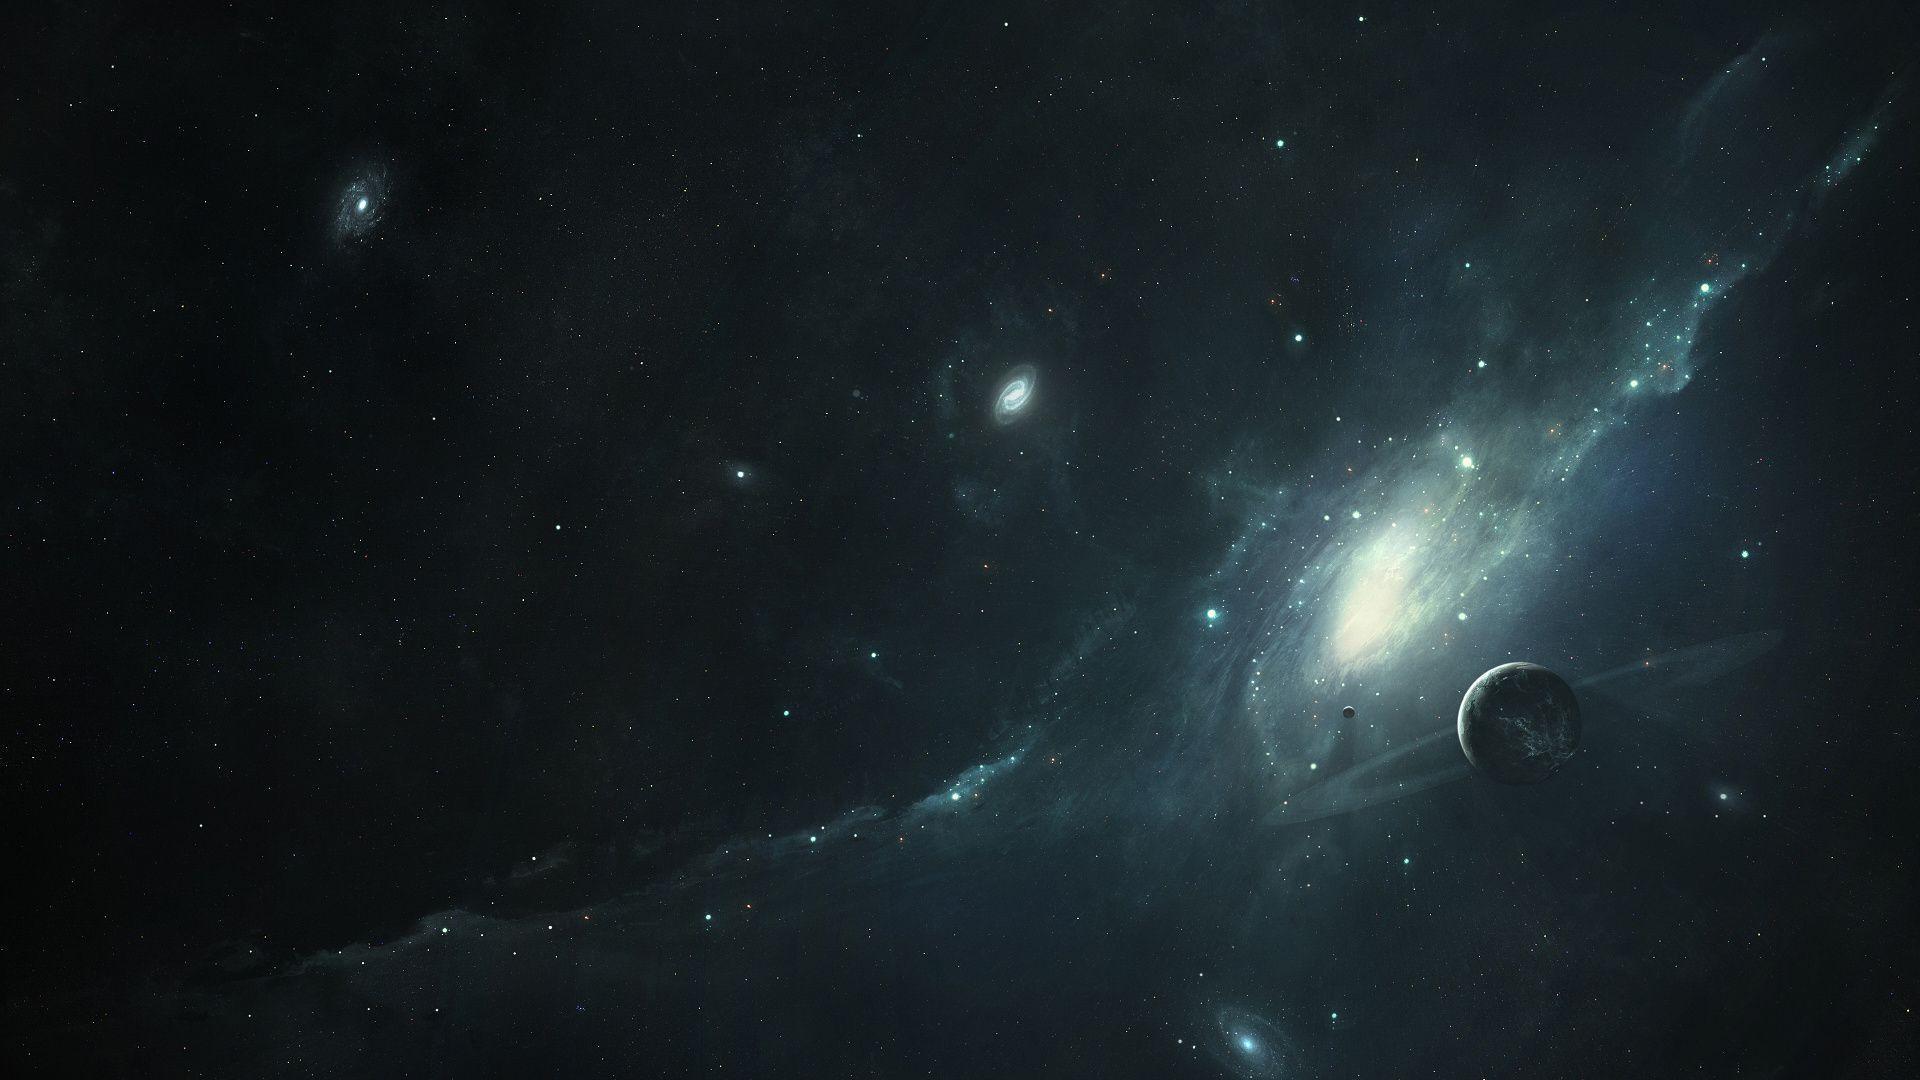 Dark Universe Wallpapers Top Free Dark Universe Backgrounds Wallpaperaccess